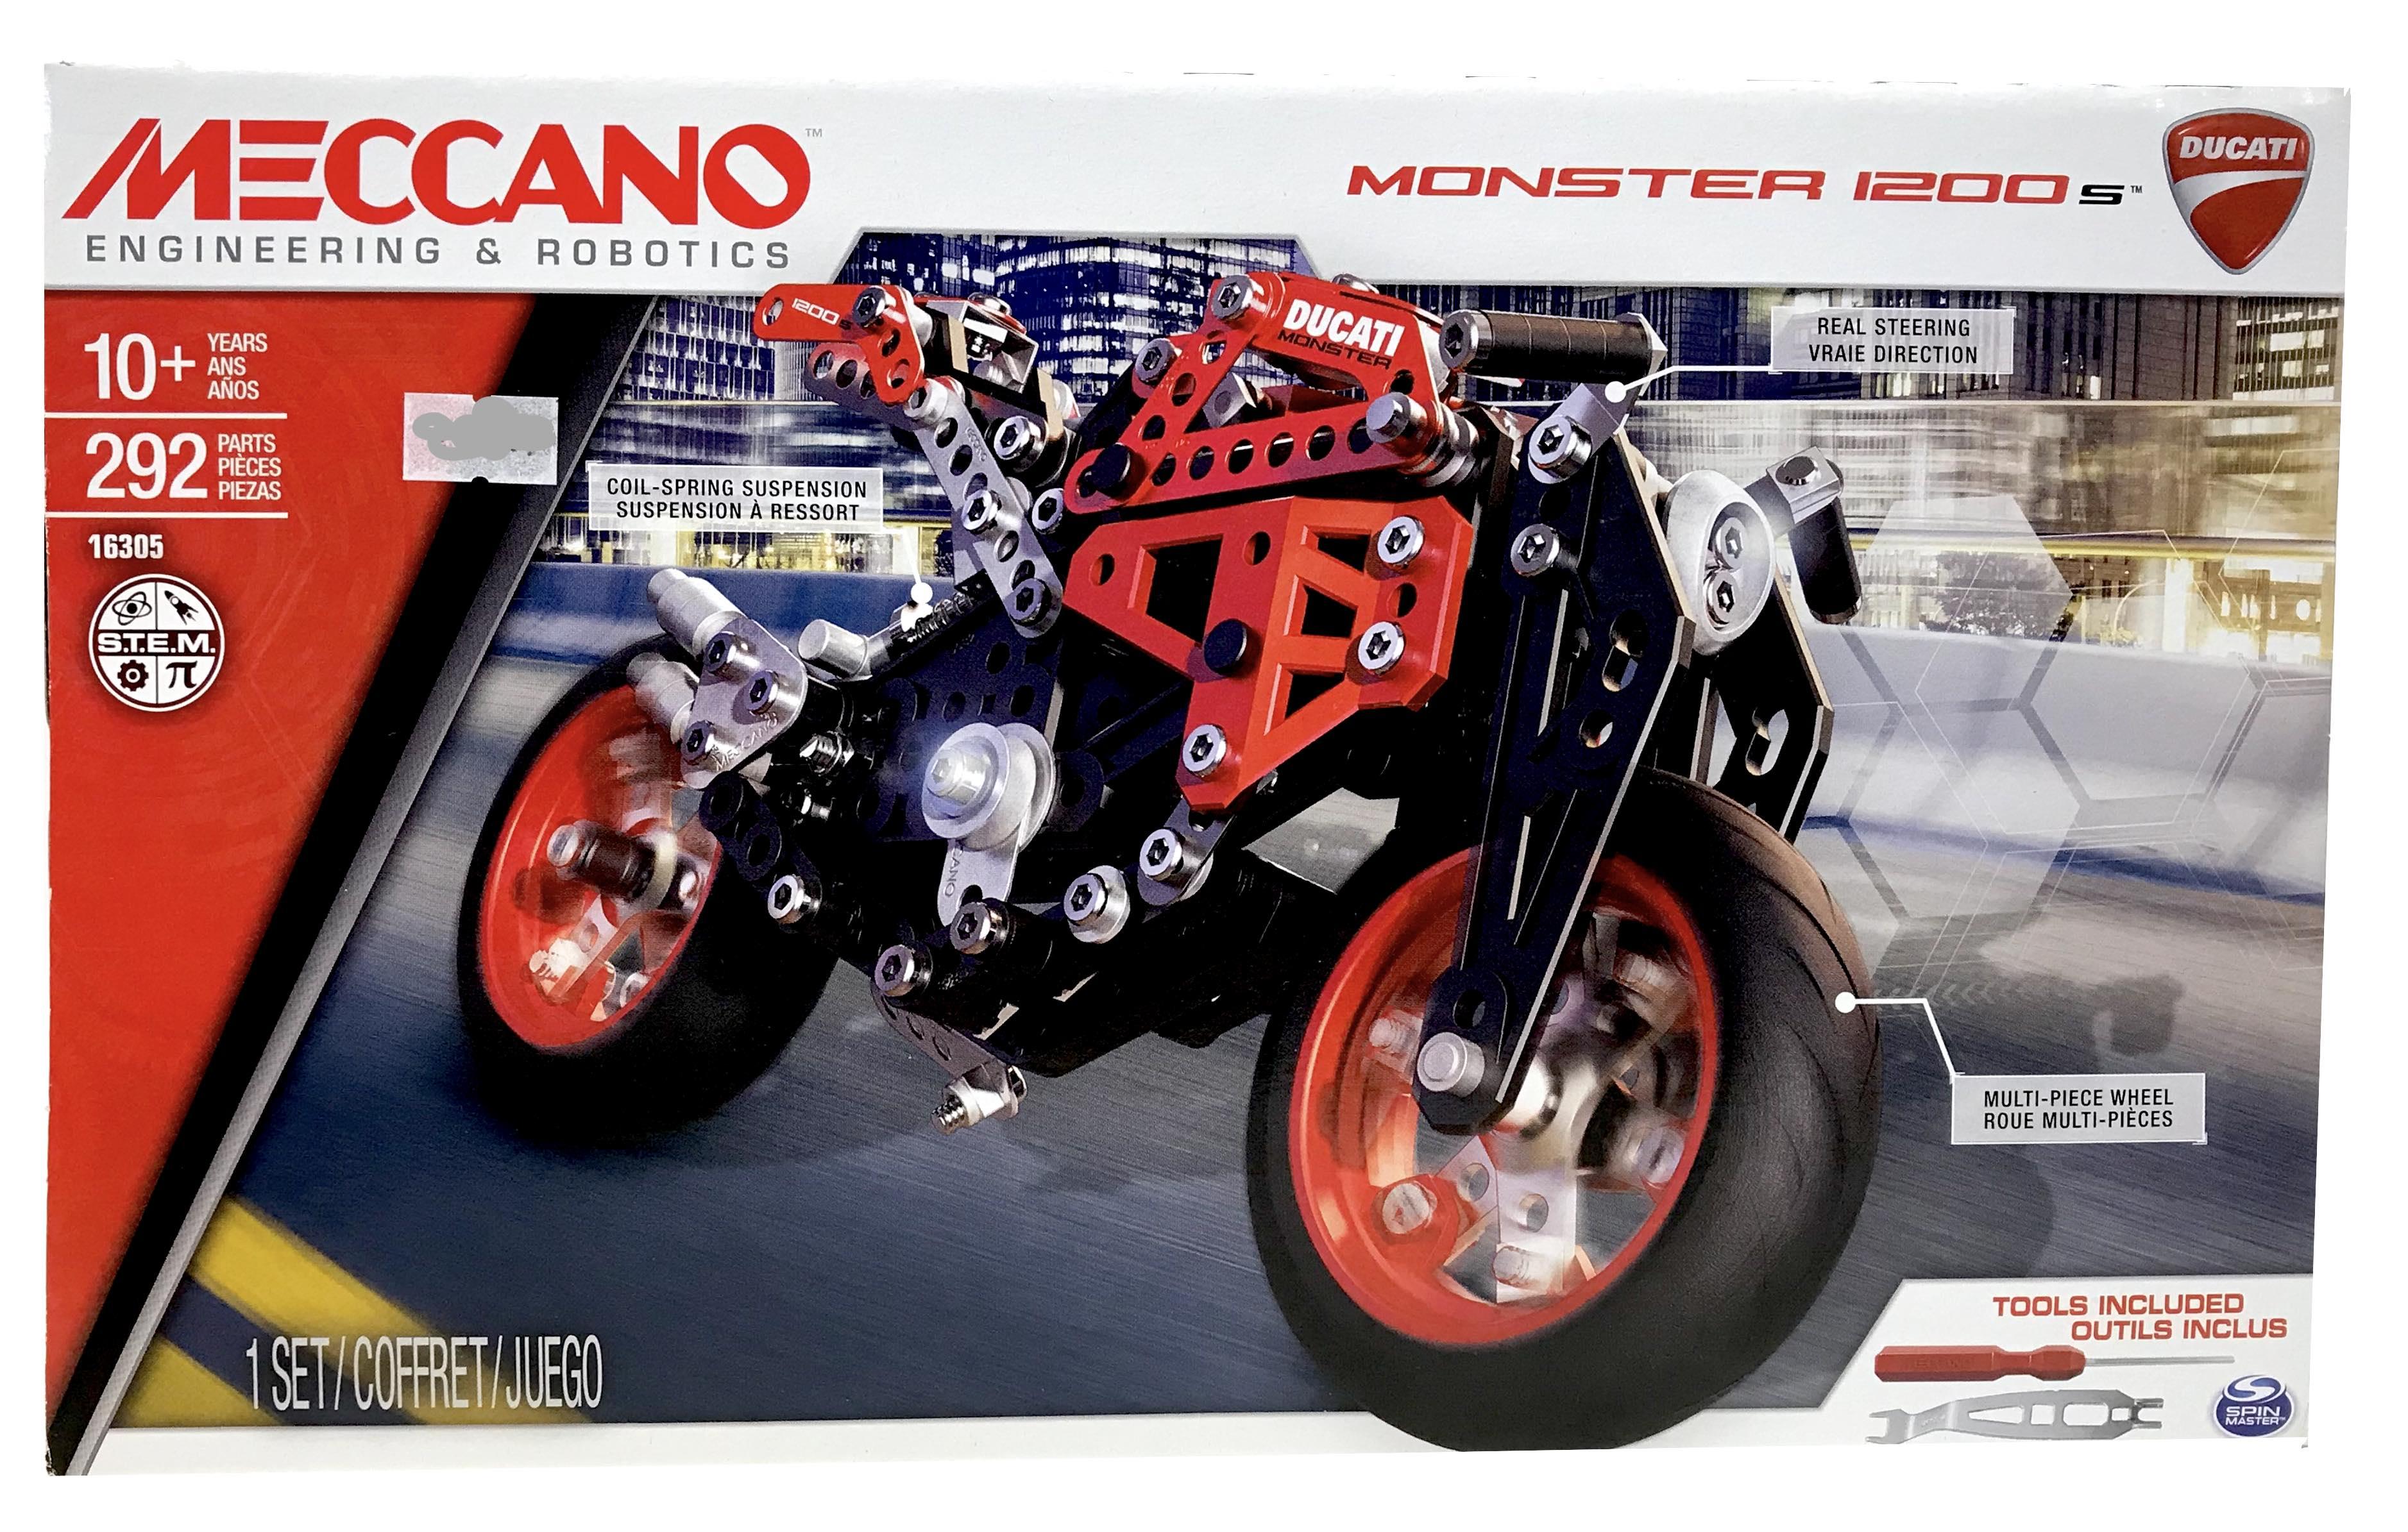 Meccano Monster 1200